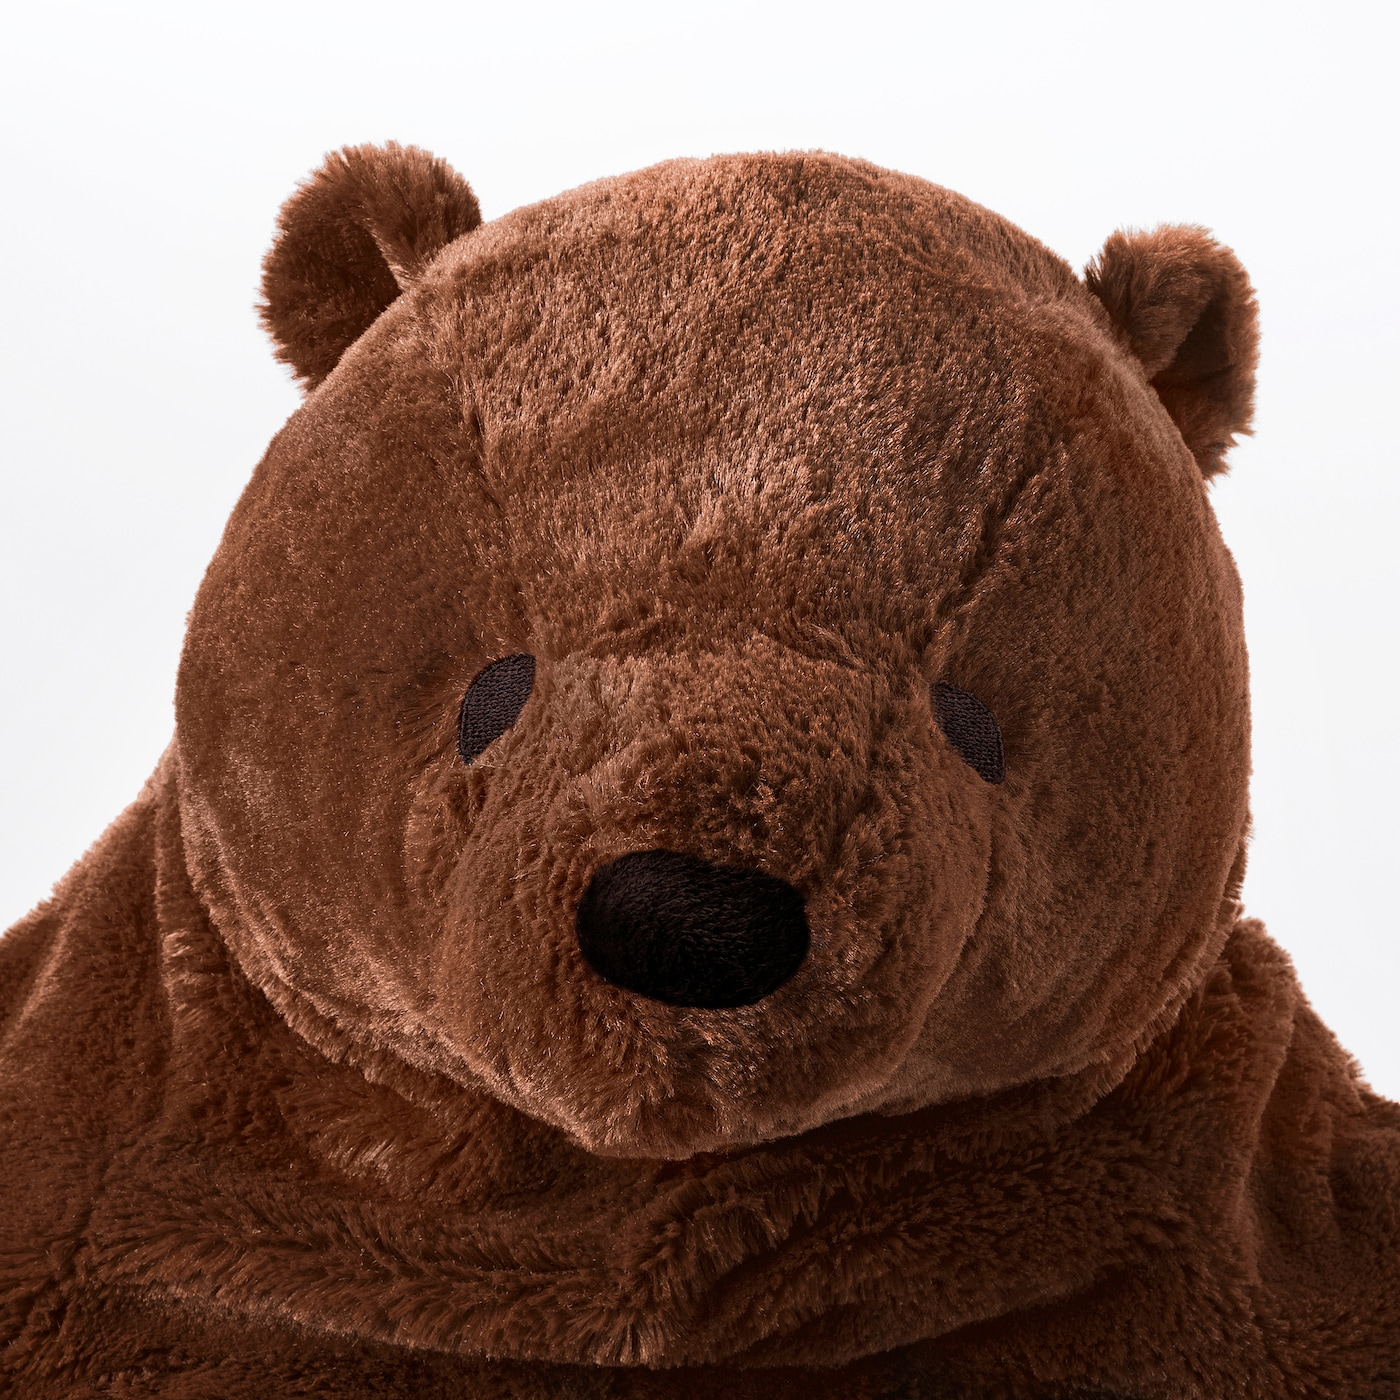 DJUNGELSKOG 尤恩格斯库格 毛绒玩具, 熊